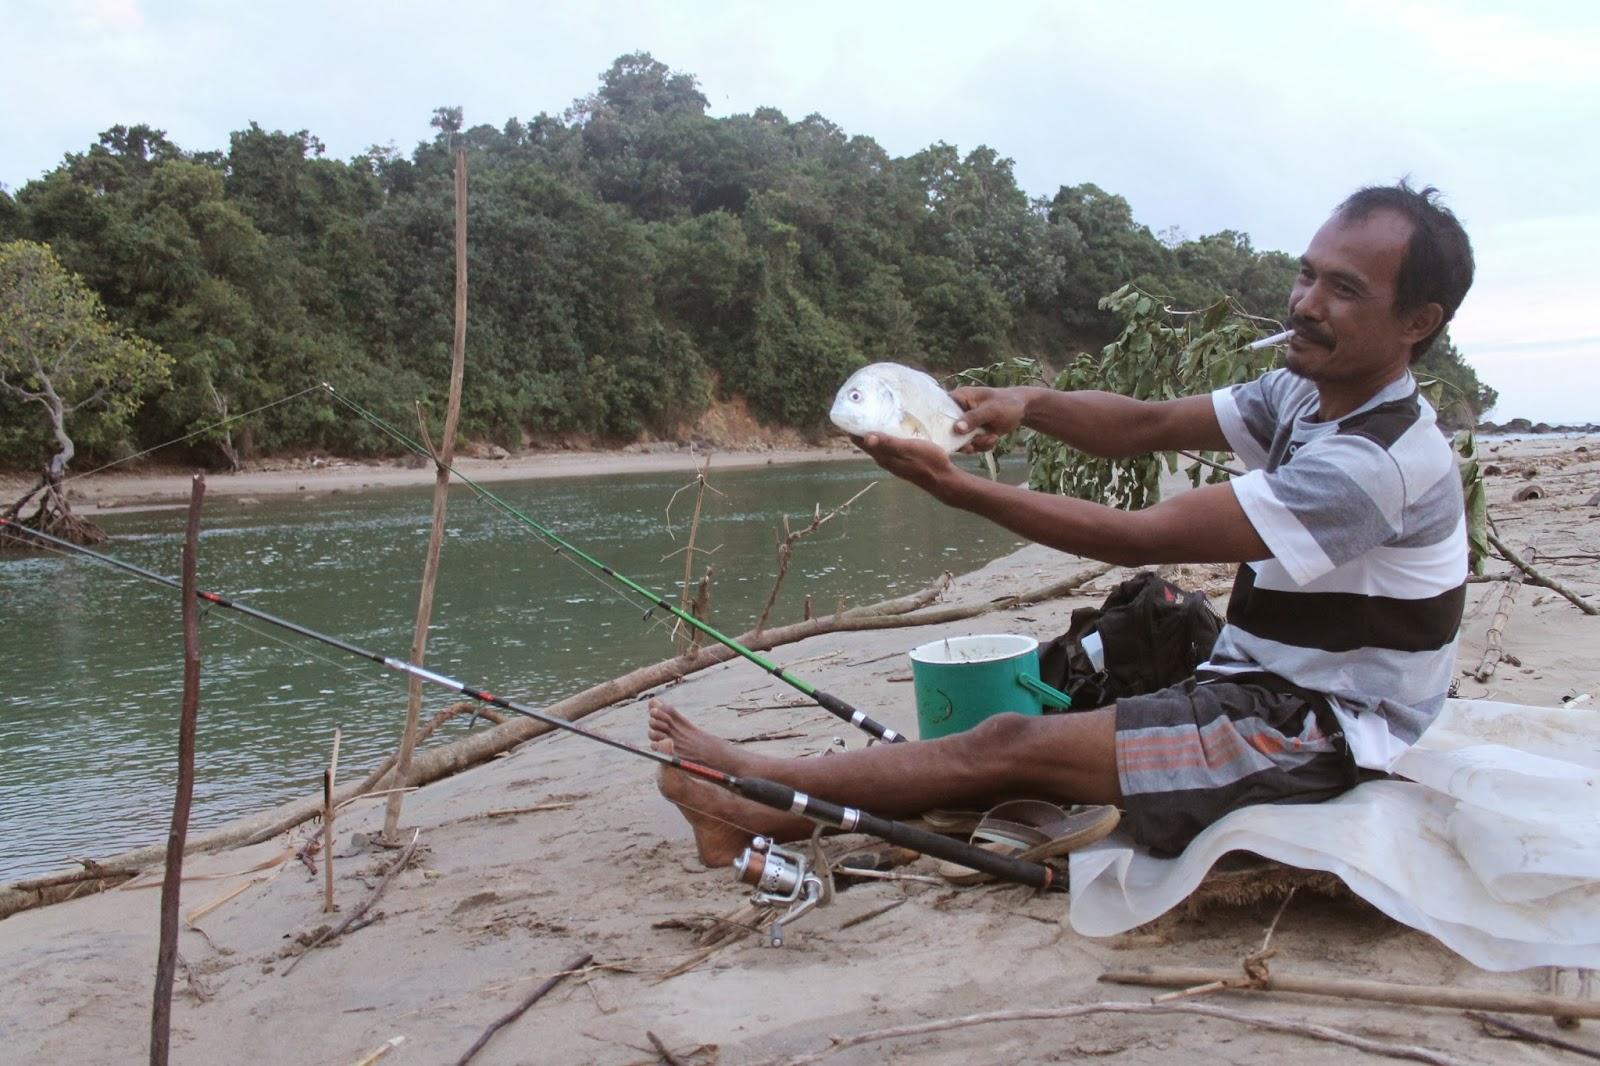 Pantai Tamban, Tempat Favorit Bagi Para Pemancing - Motivasinews.com